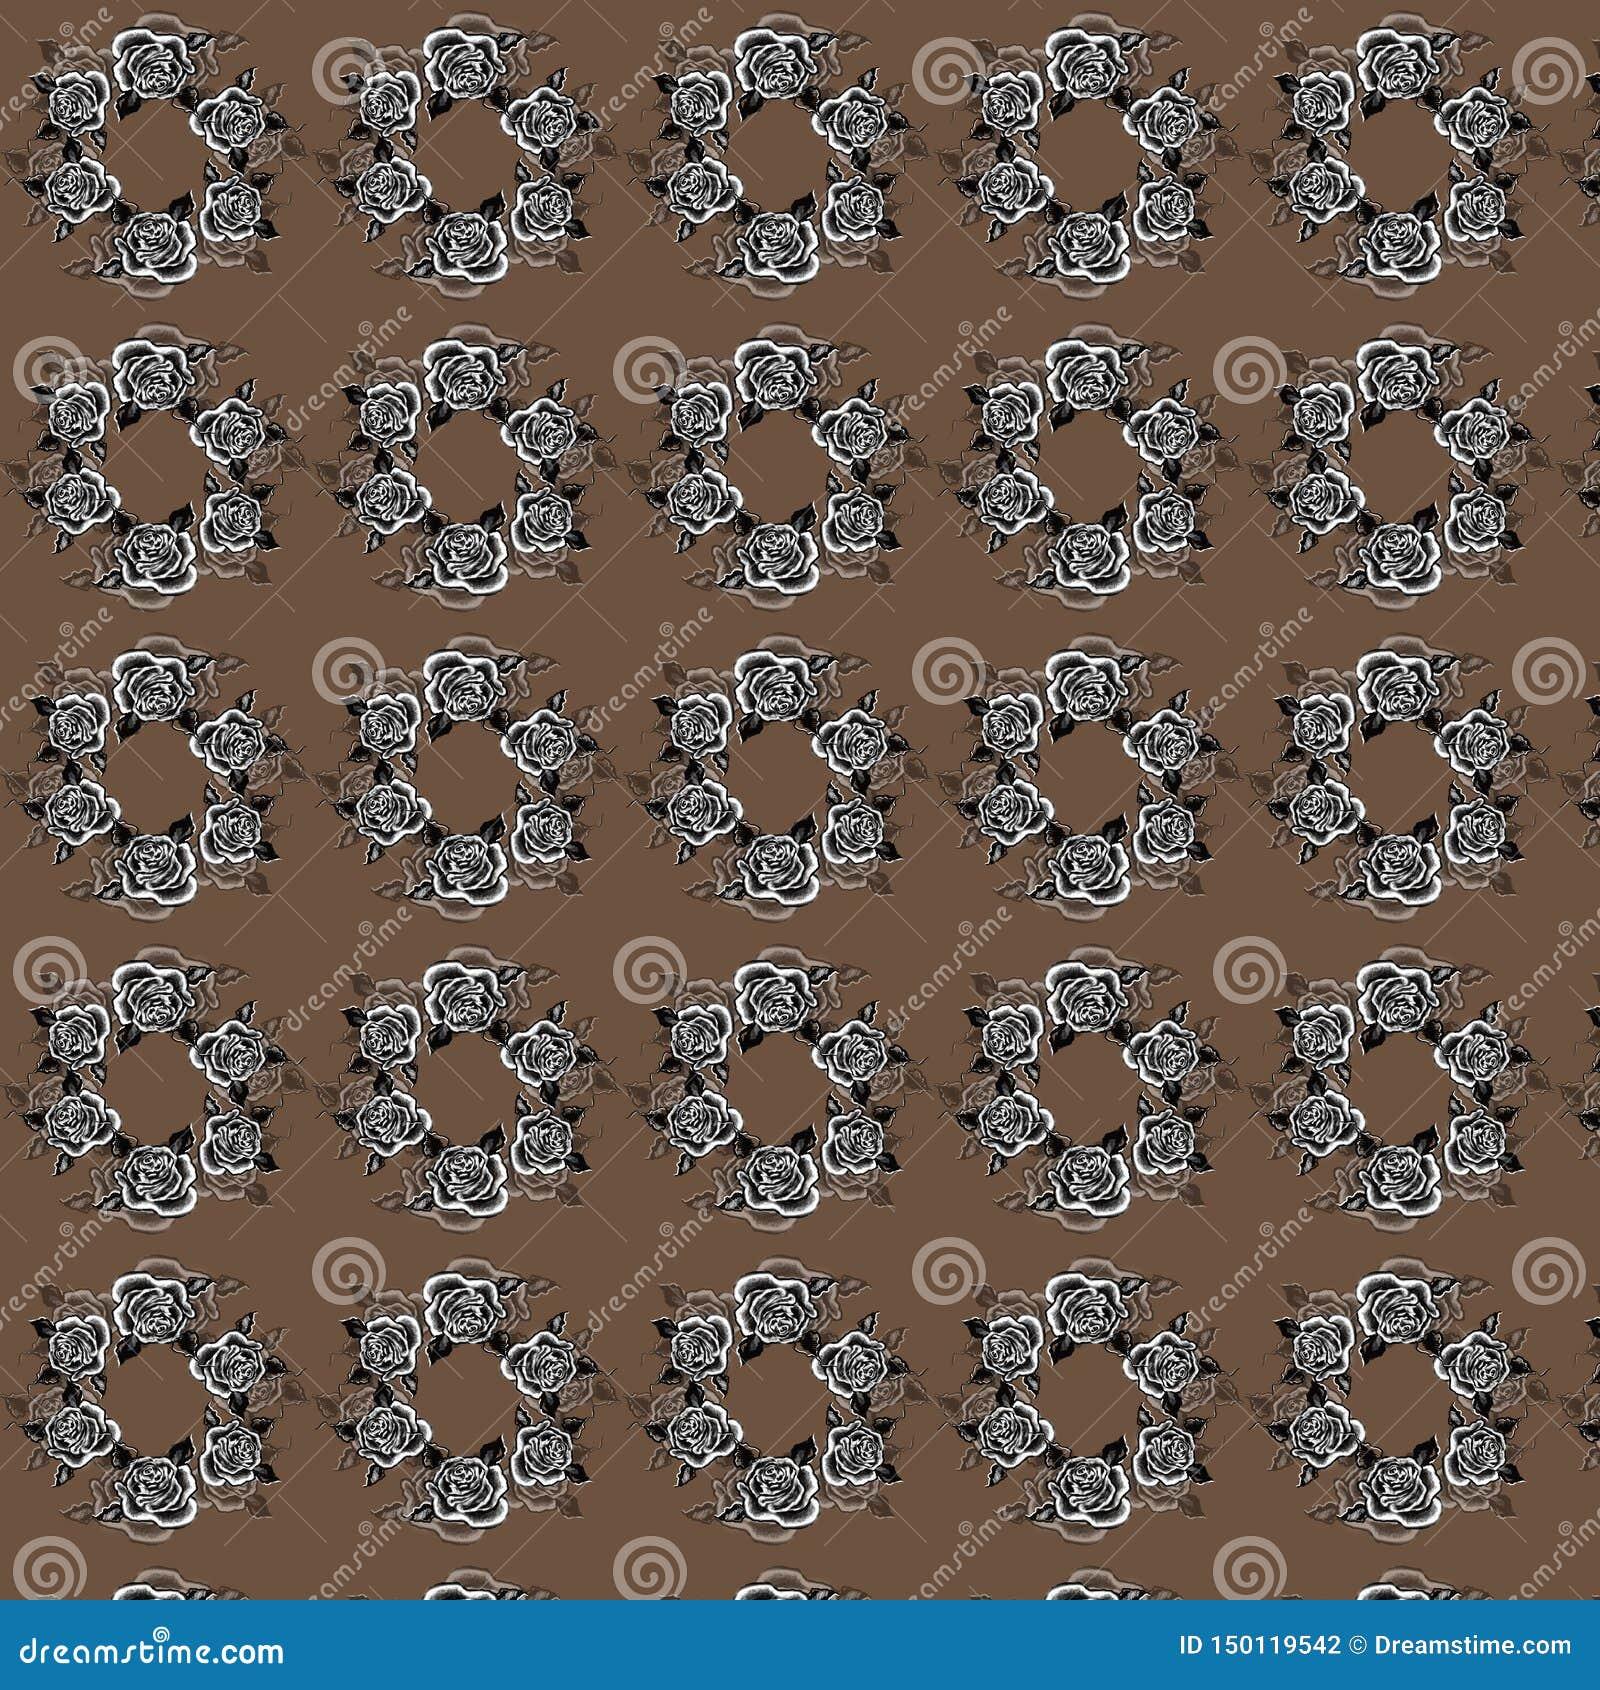 Rose Digital Paper Pack, rosas negras, boda, Scrapbooking, rosas, rosas del vintage